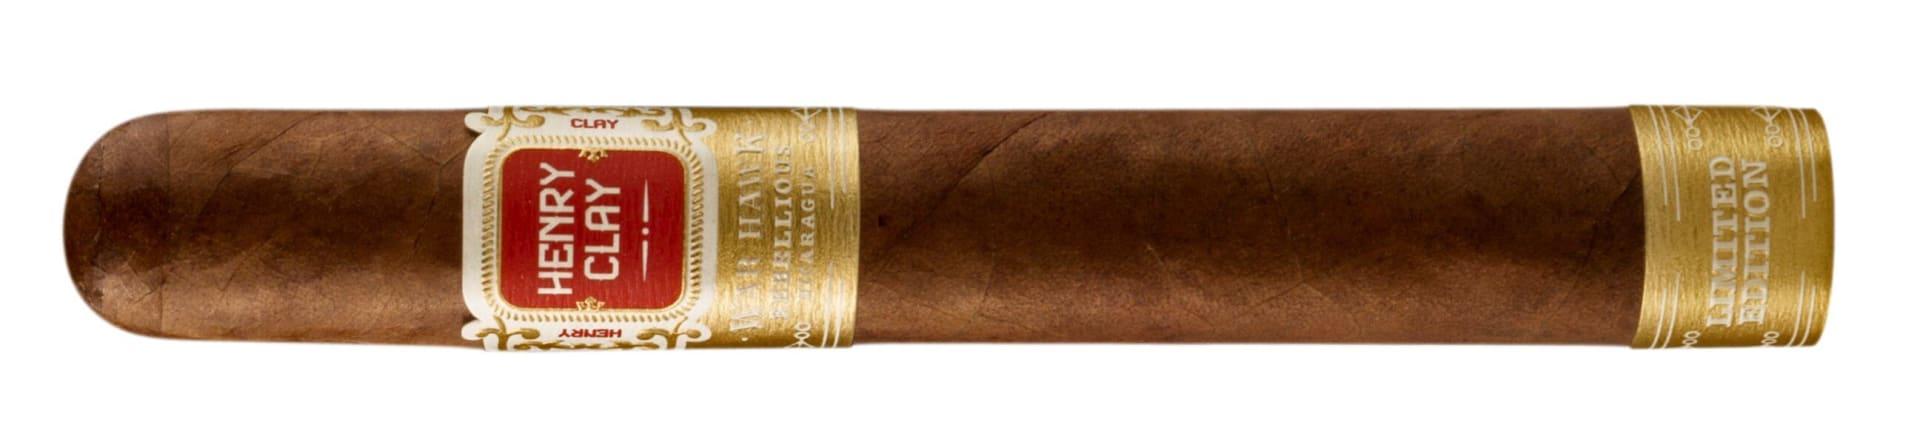 Cigar News: Altadis U.S.A. Announces Henry Clay War Hawk Rebellious Ltd. Ed. Featured Image